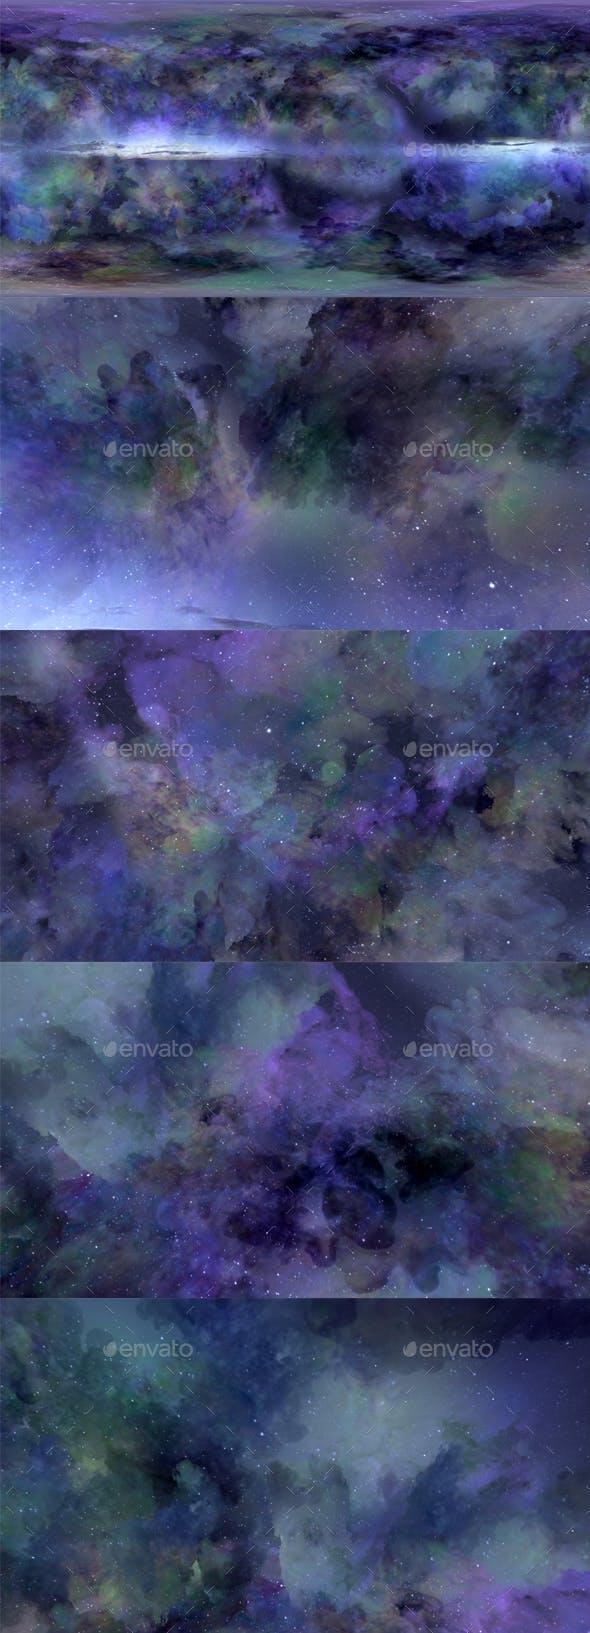 Skydome HDRI - Stardust Sky 2 - 3DOcean Item for Sale